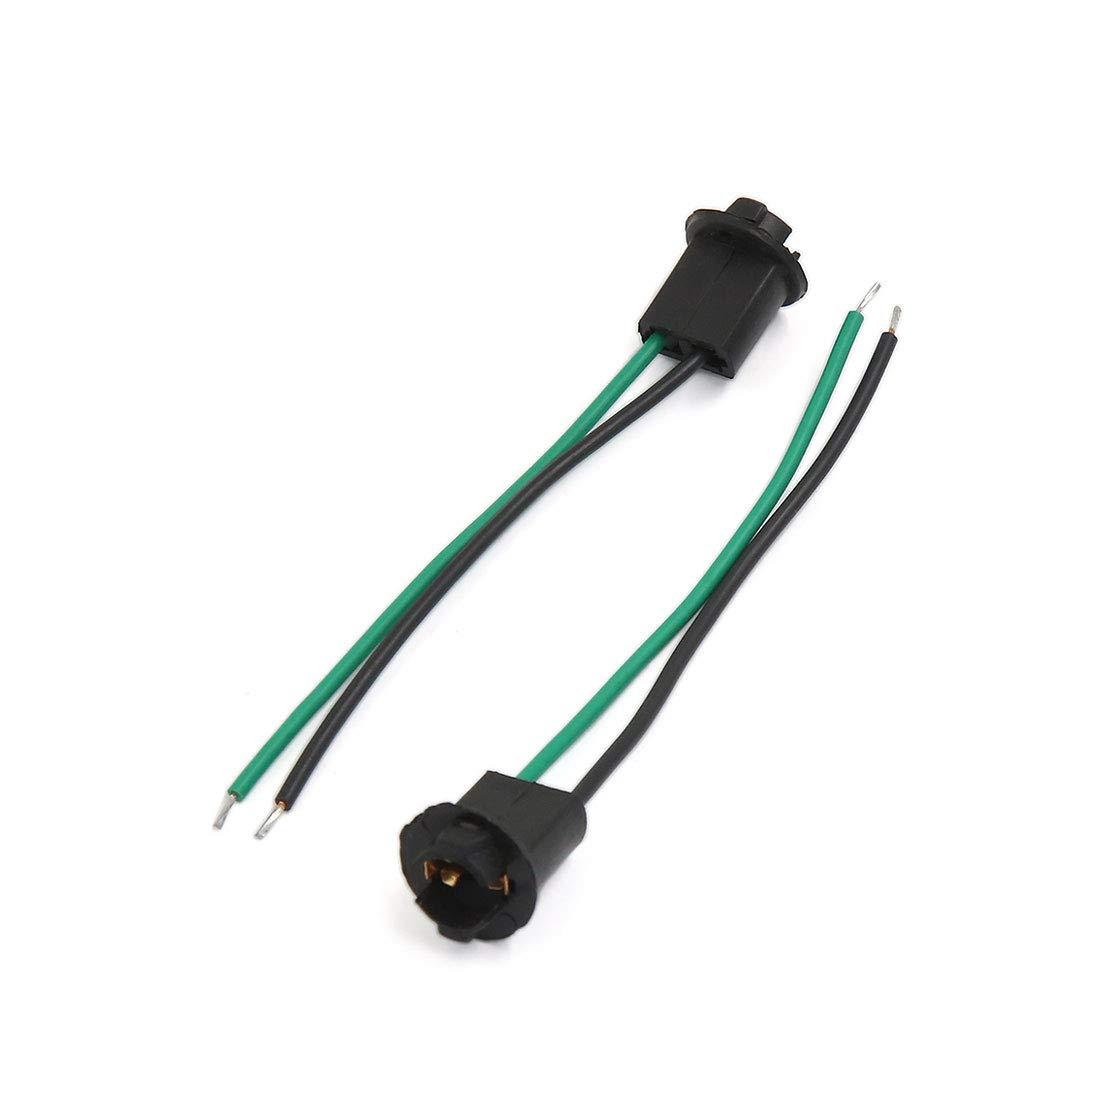 wrg 7963] t10 12 volt wire harness 12 Volt Fuel Tank amazon com uxcell dc 12v t10 w5w 168 194 car socket connector extension led